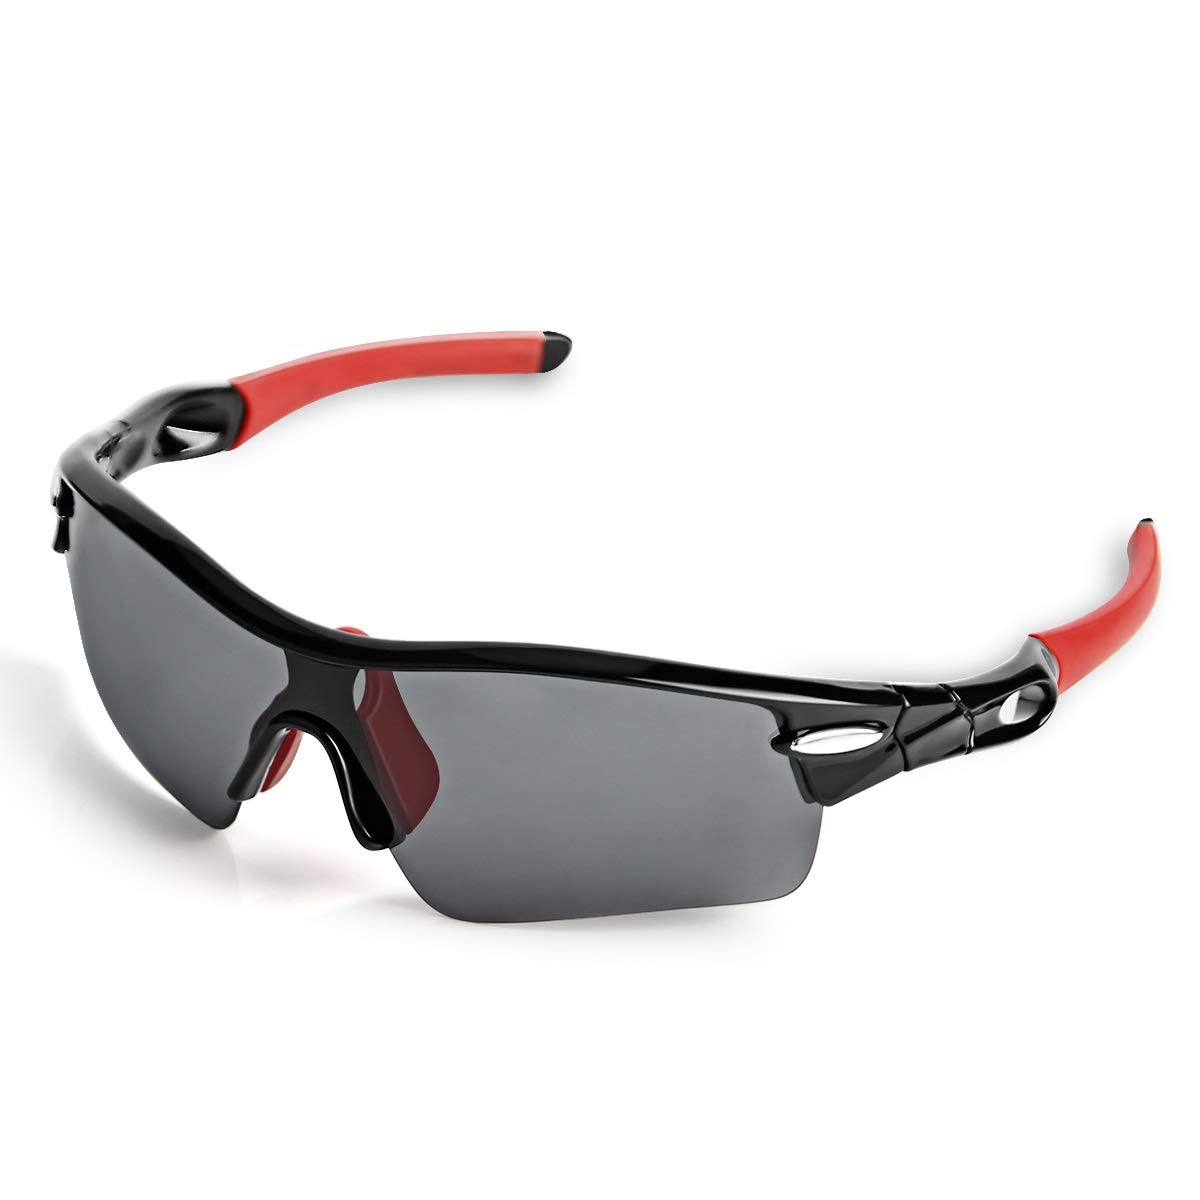 7b8fb64fb1 WONGKUO Polarized Sports Sunglasses for Men Women 5 Interchangeable Lenses  at Amazon Men s Clothing store